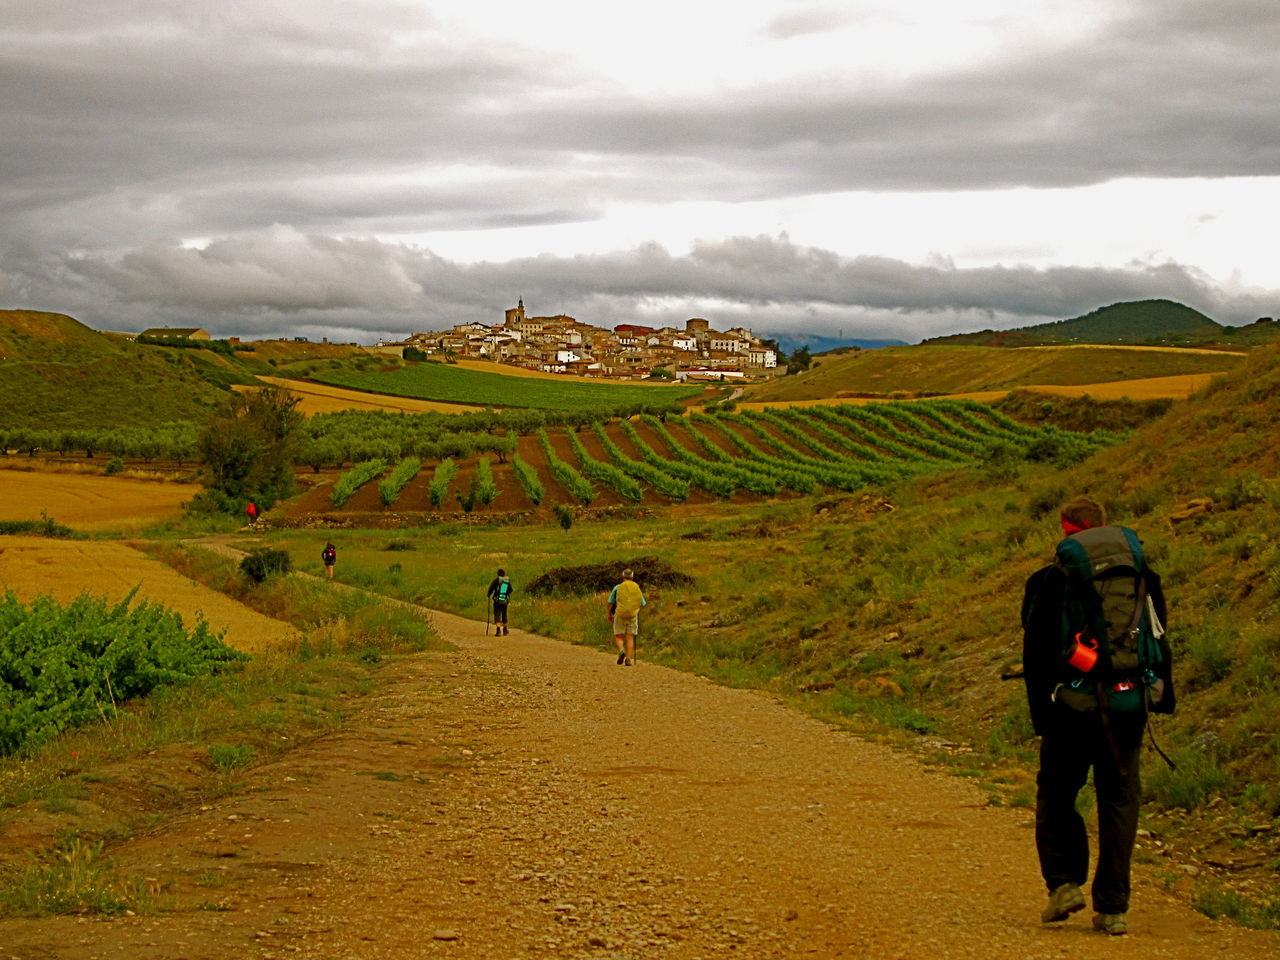 The Tourist Hot Backpackers Spain ✈️🇪🇸 Walking Summertime El Camino De Santiago Vineyard Walking Path Countryside